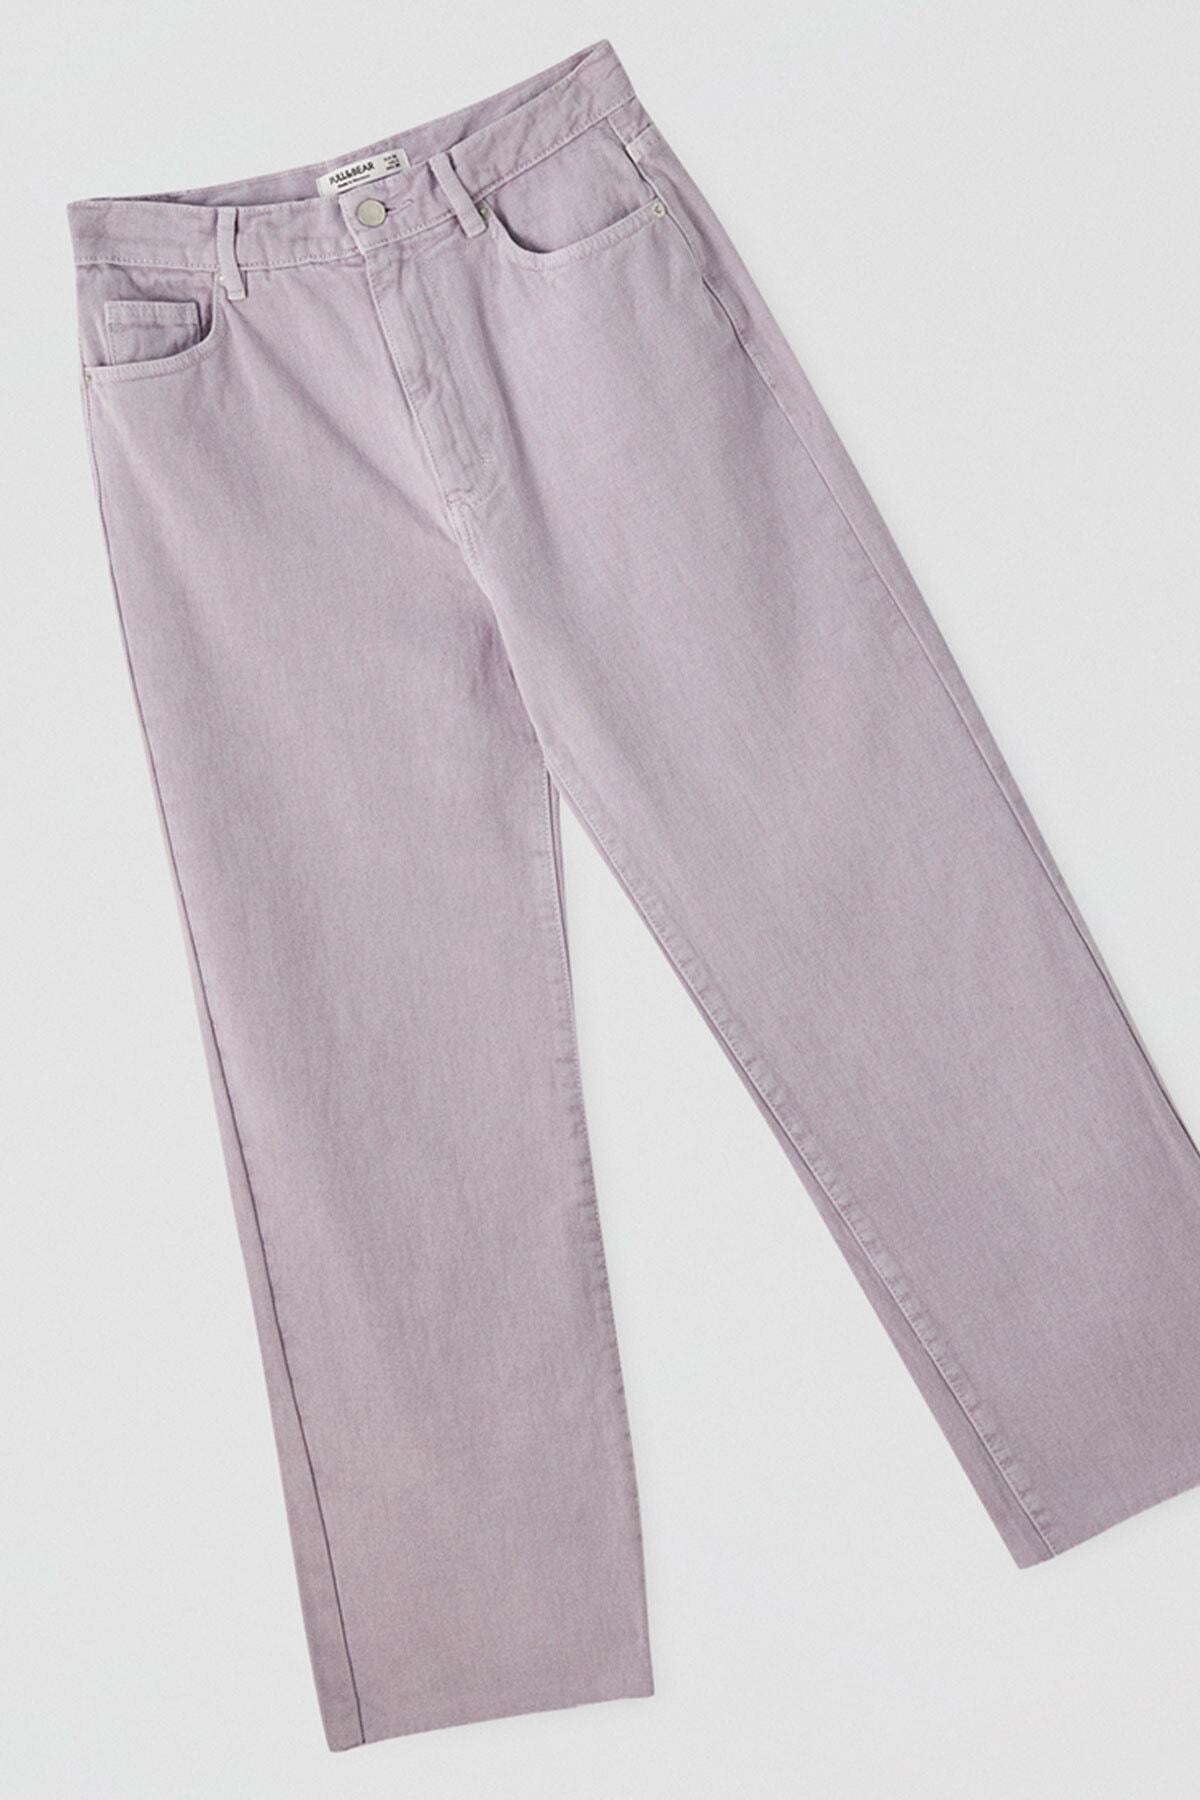 Pull & Bear Kadın Leylak Crop Straight Fit Jean 05670330 1